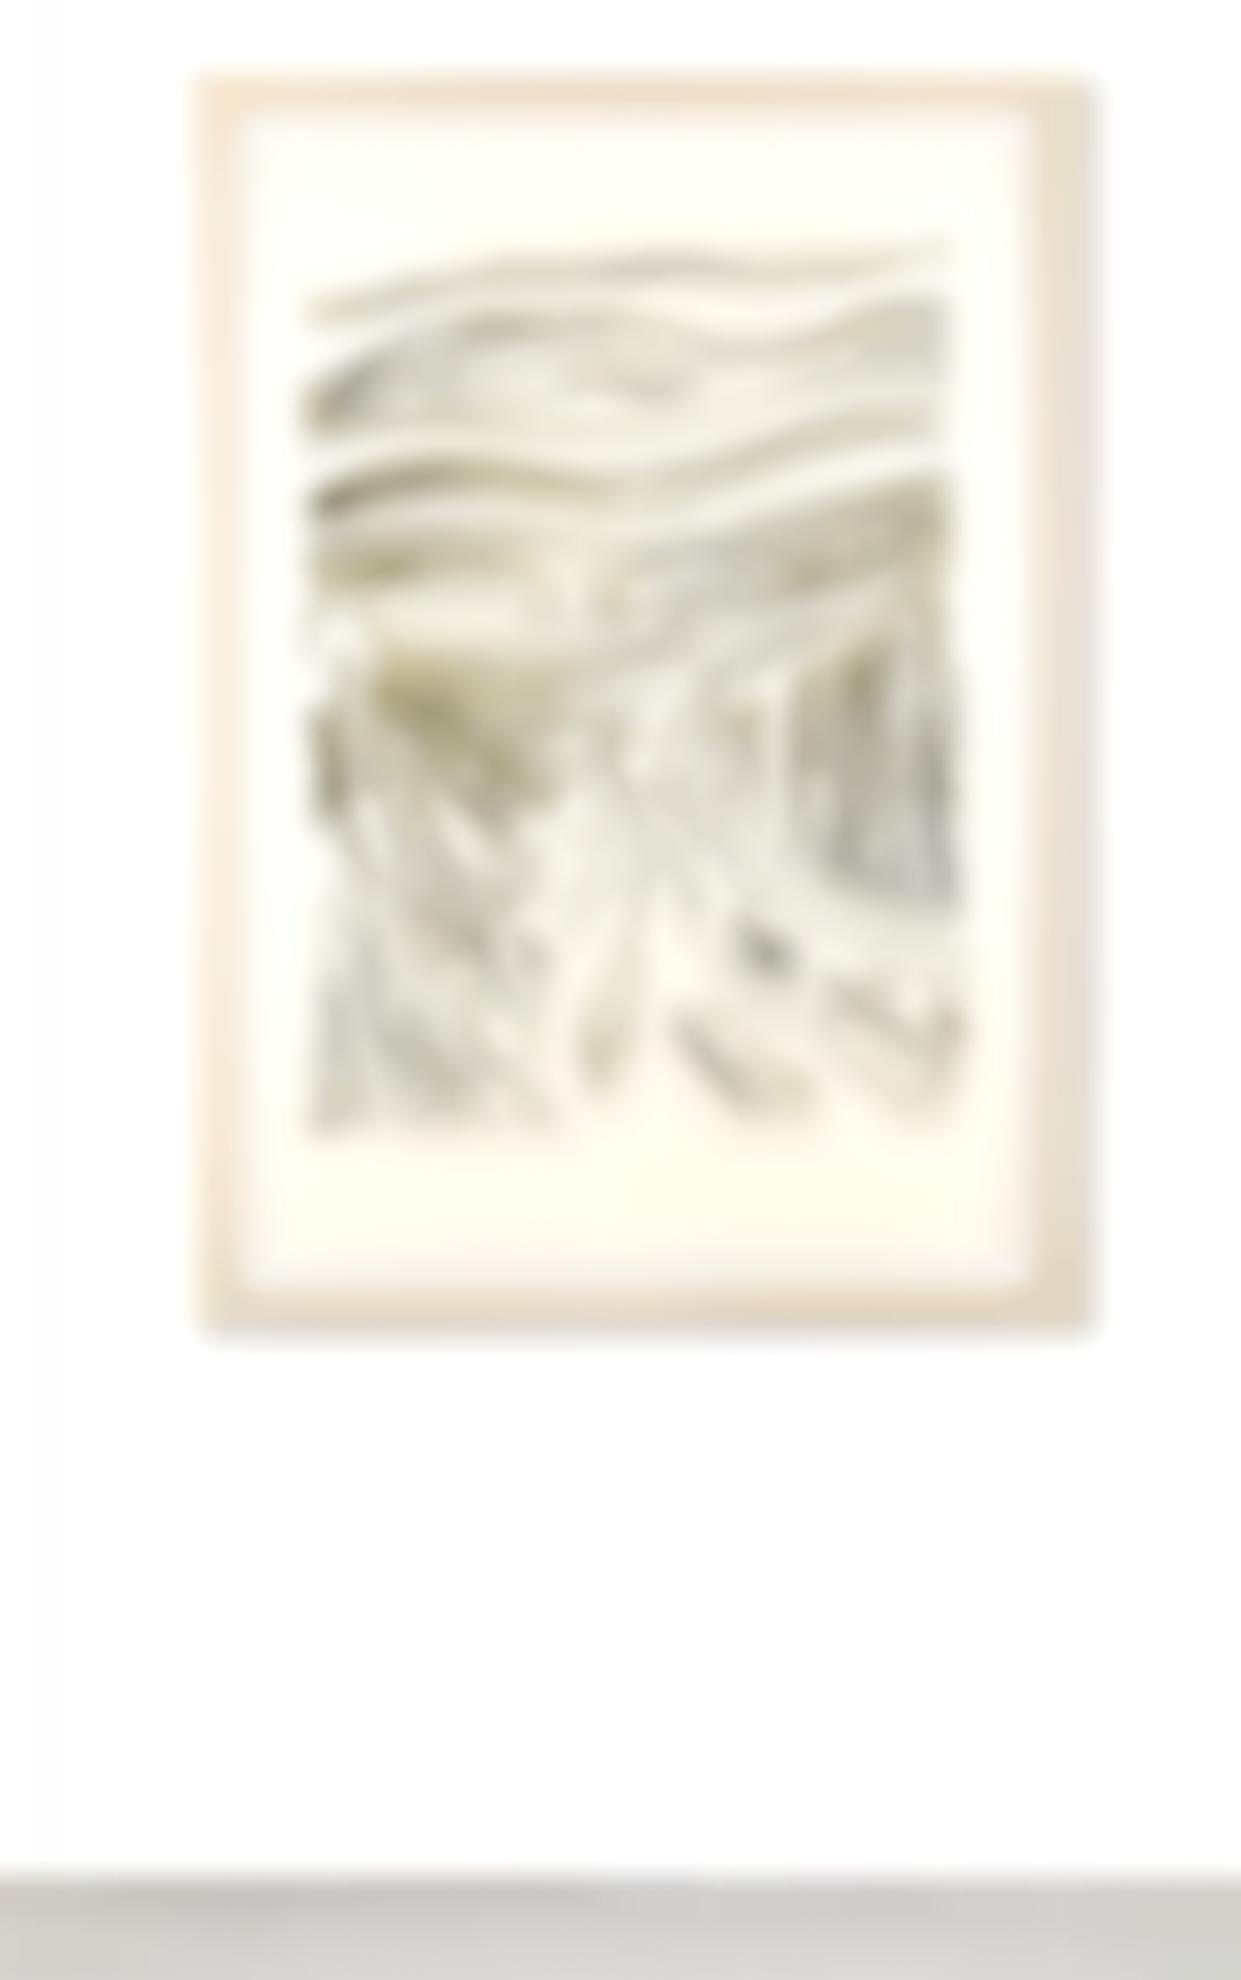 Andy Warhol-The Scream (After Munch) (F. & S. IIIa.58[B])-1984